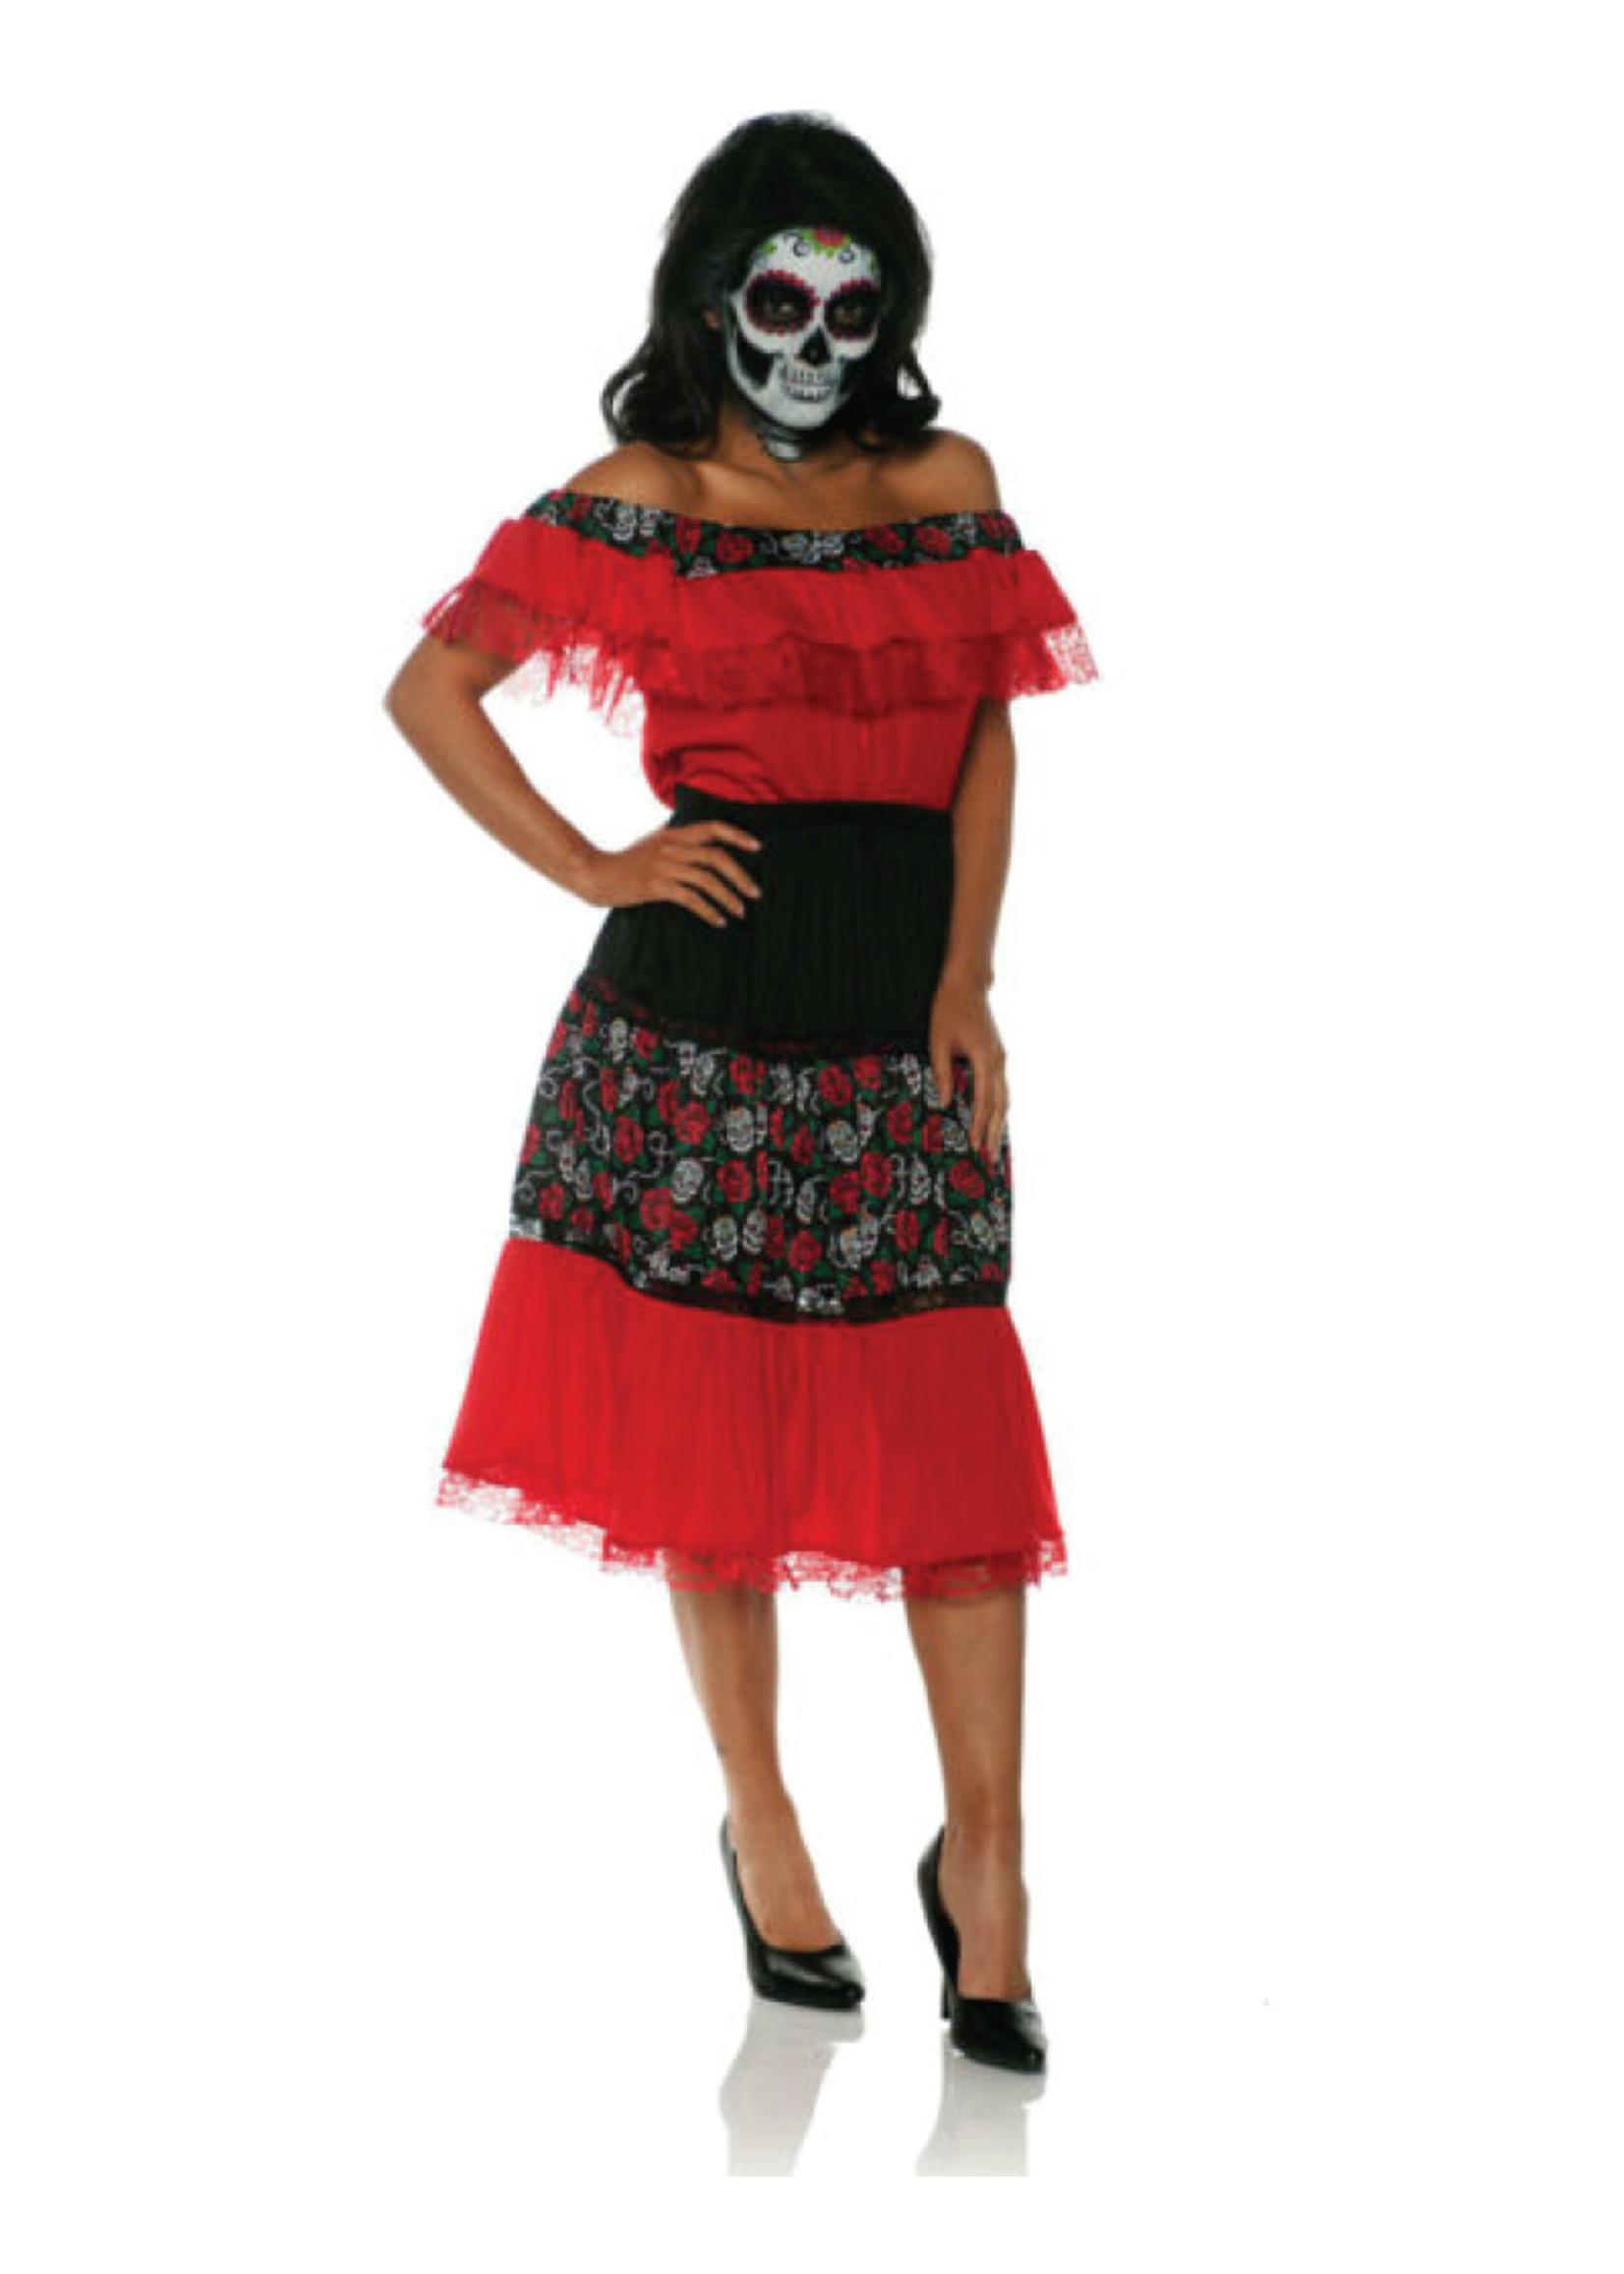 Skull Senorita - Women's